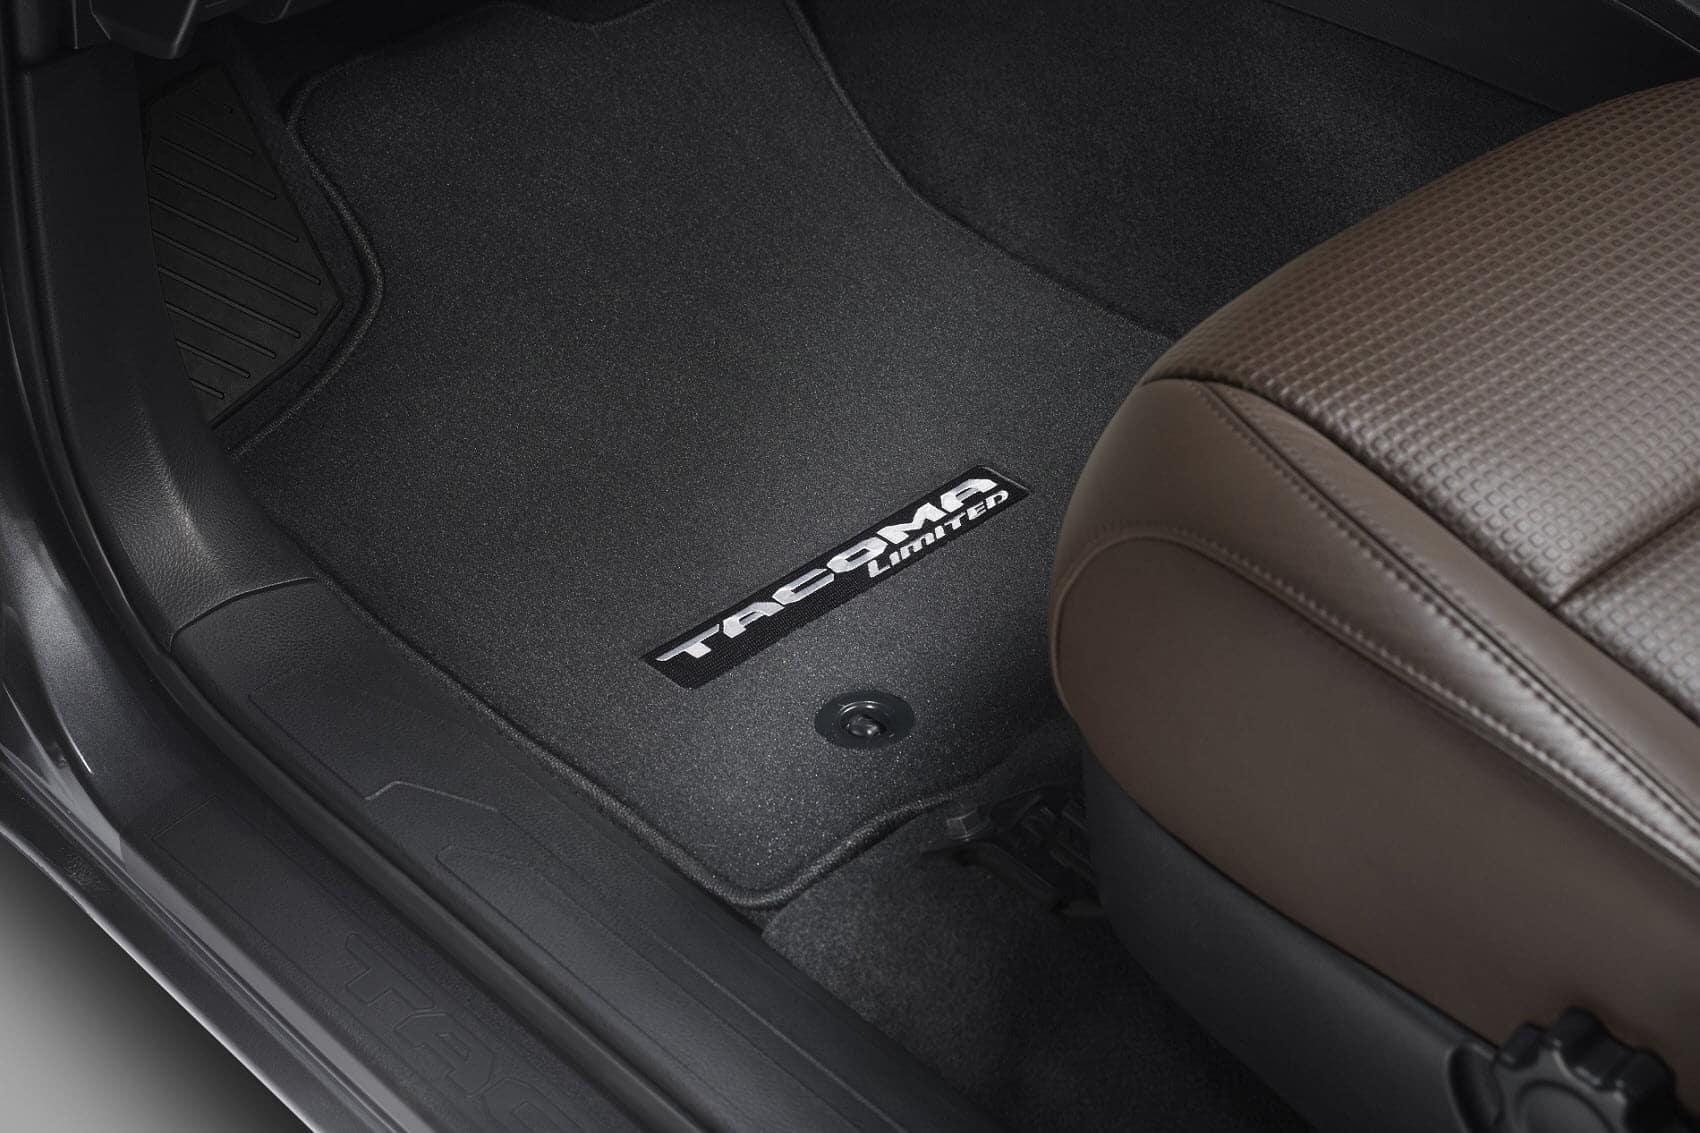 2020 Toyota Tacoma Carpet Floor Mats